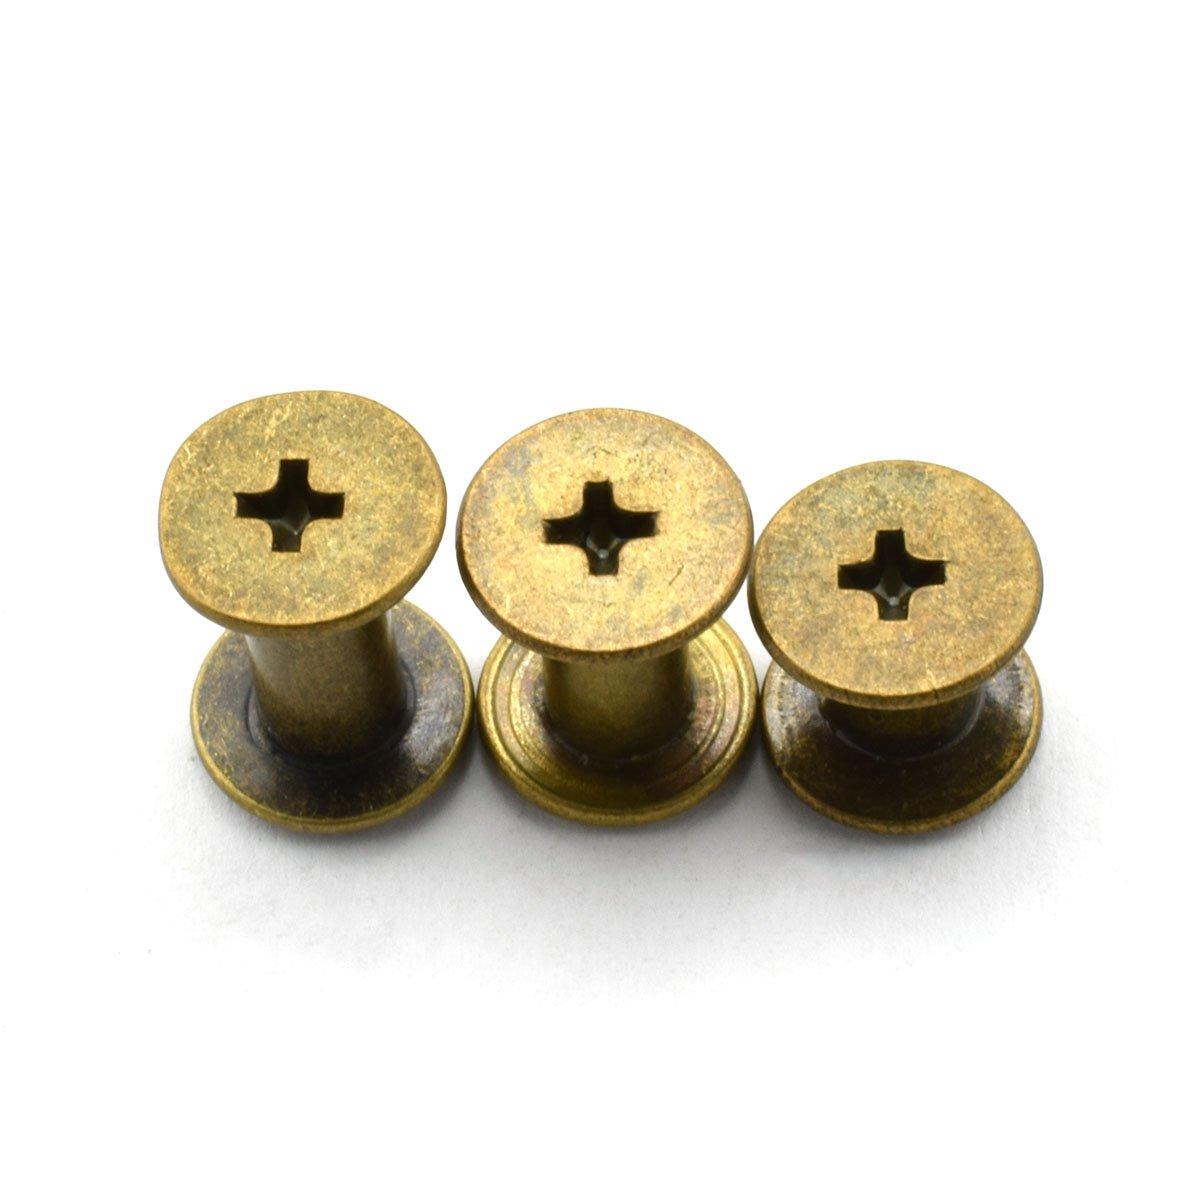 LQ Industrial 90 Sets Black M5 Chicago Screw Assorted Kit Phillips Head Button Stud Screws Nail Rivet For DIY Leather Craft M5x6 M5x10 M5x12 4336864001